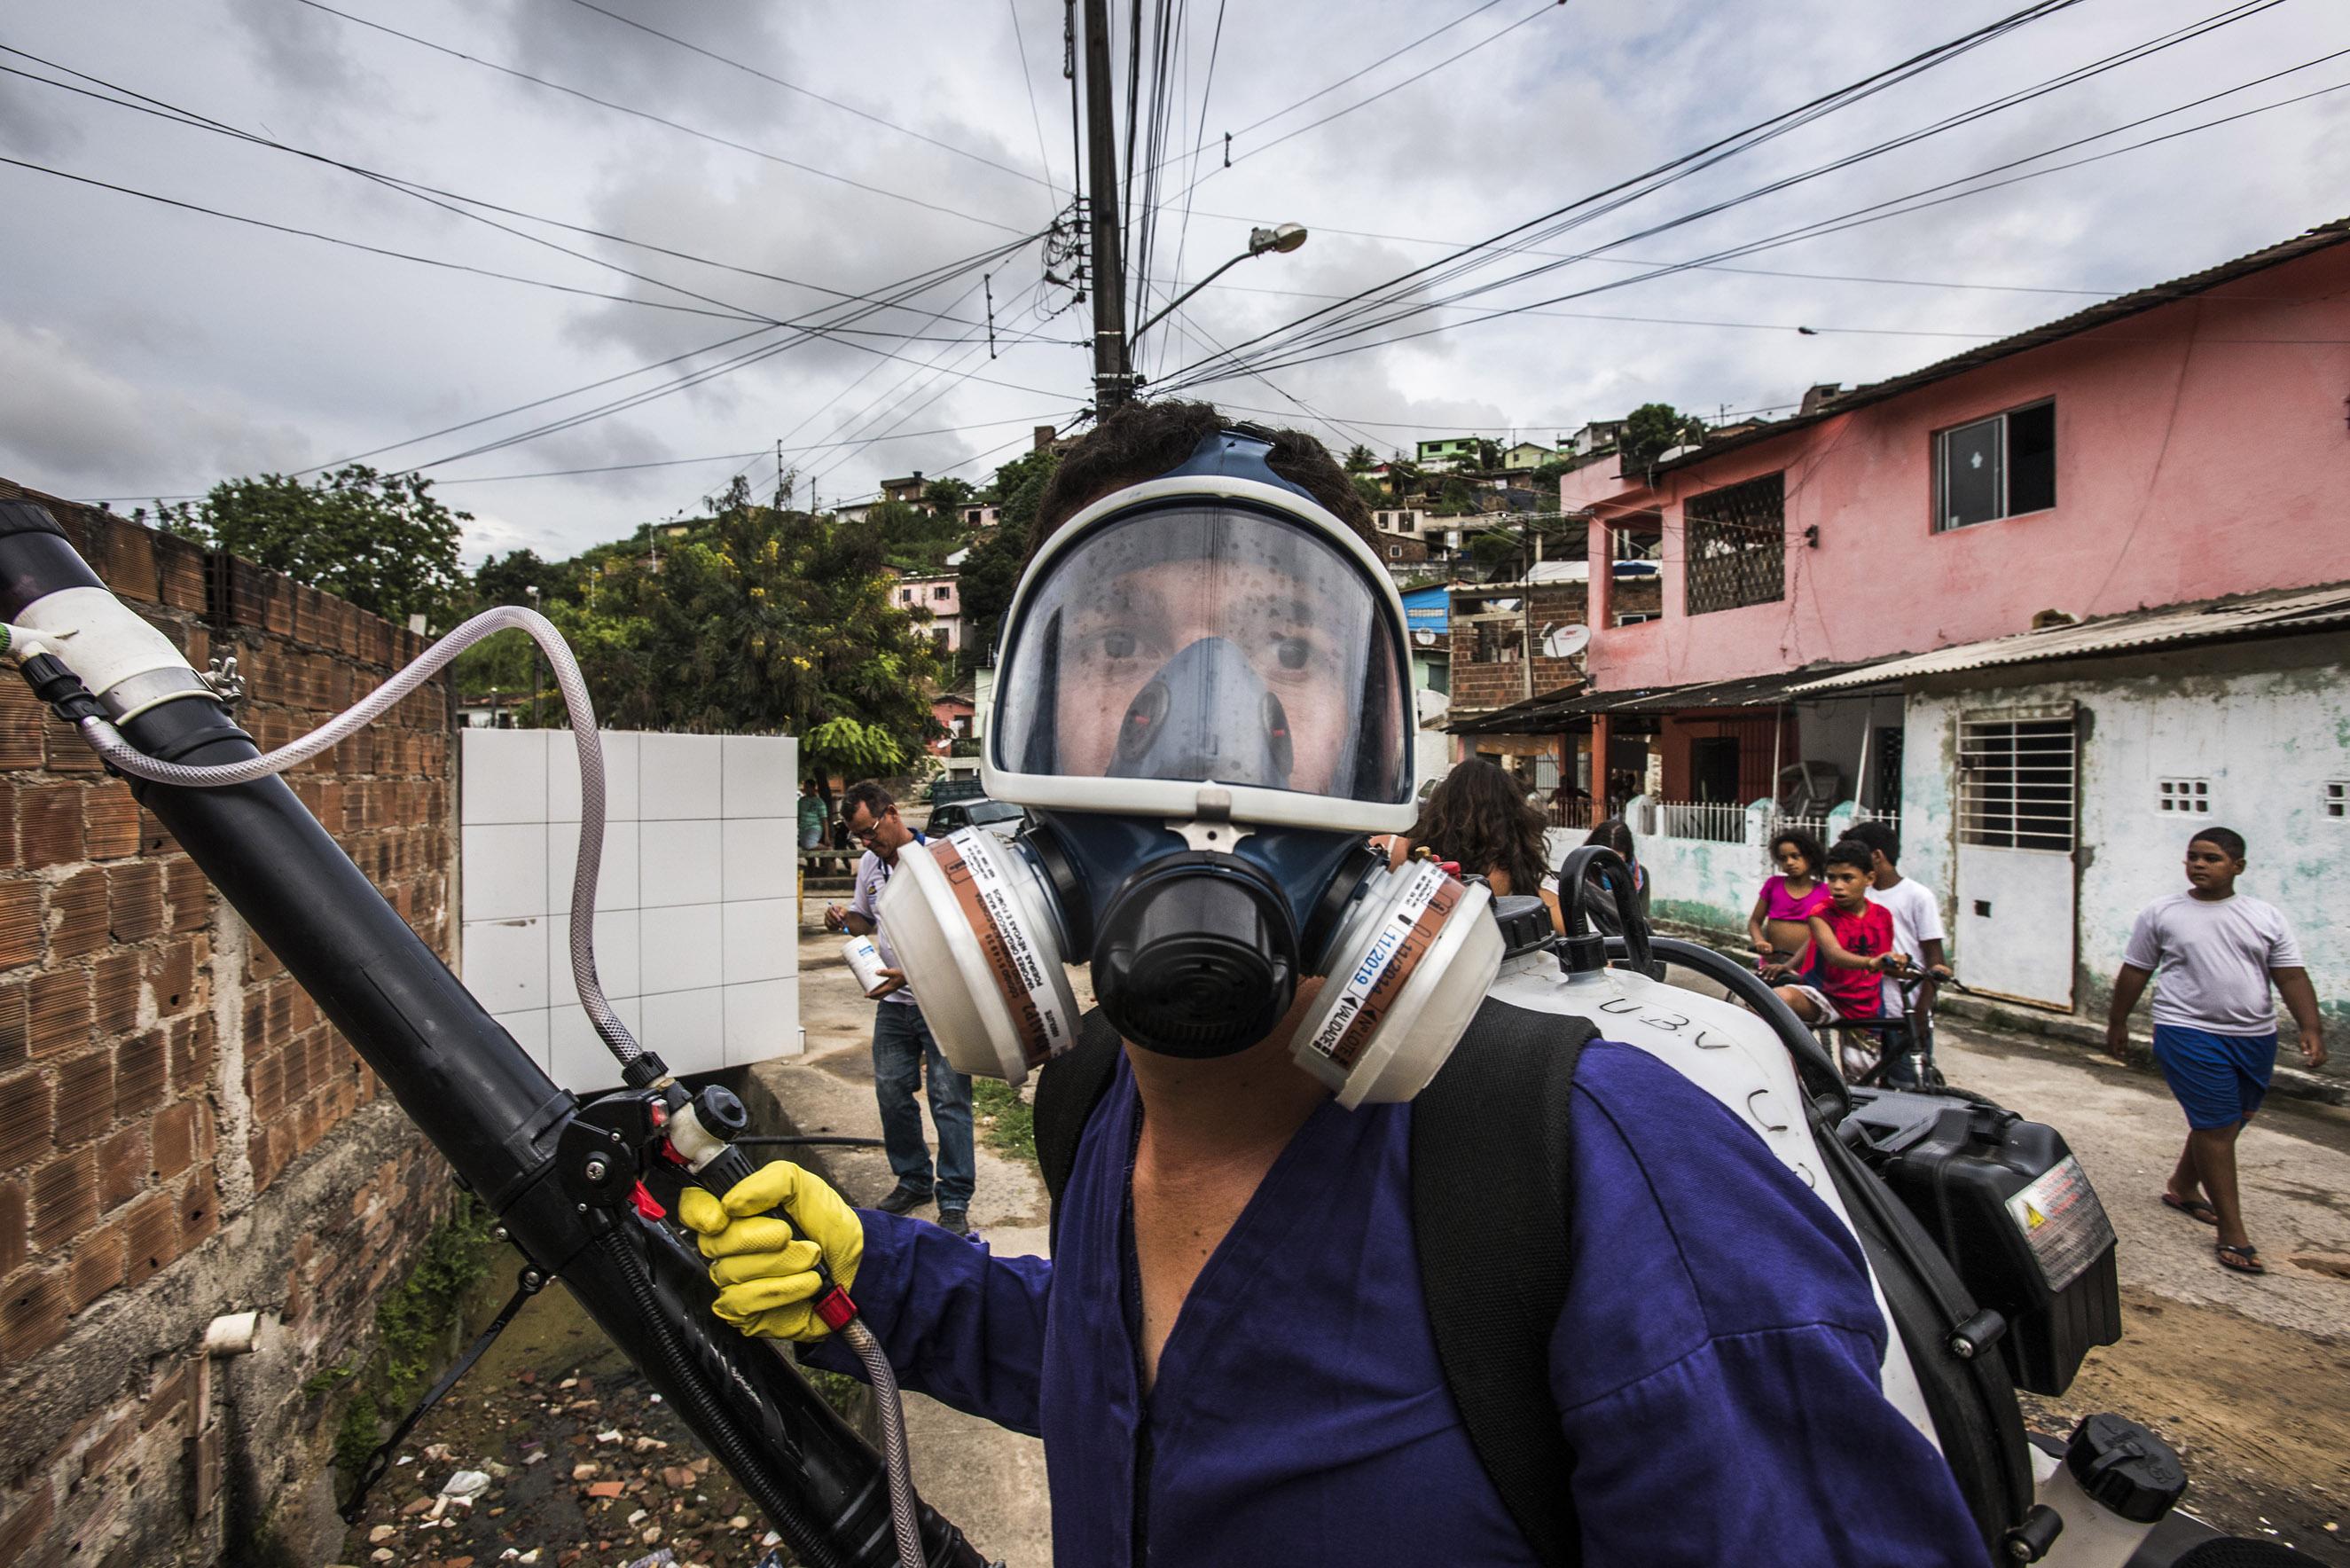 A health worker sprays insecticide in the Nova Descoberta neighborhood of Recife, Brazil, Feb. 1, 2016. Recife became Ground Zero for the outbreak of Zika cases.